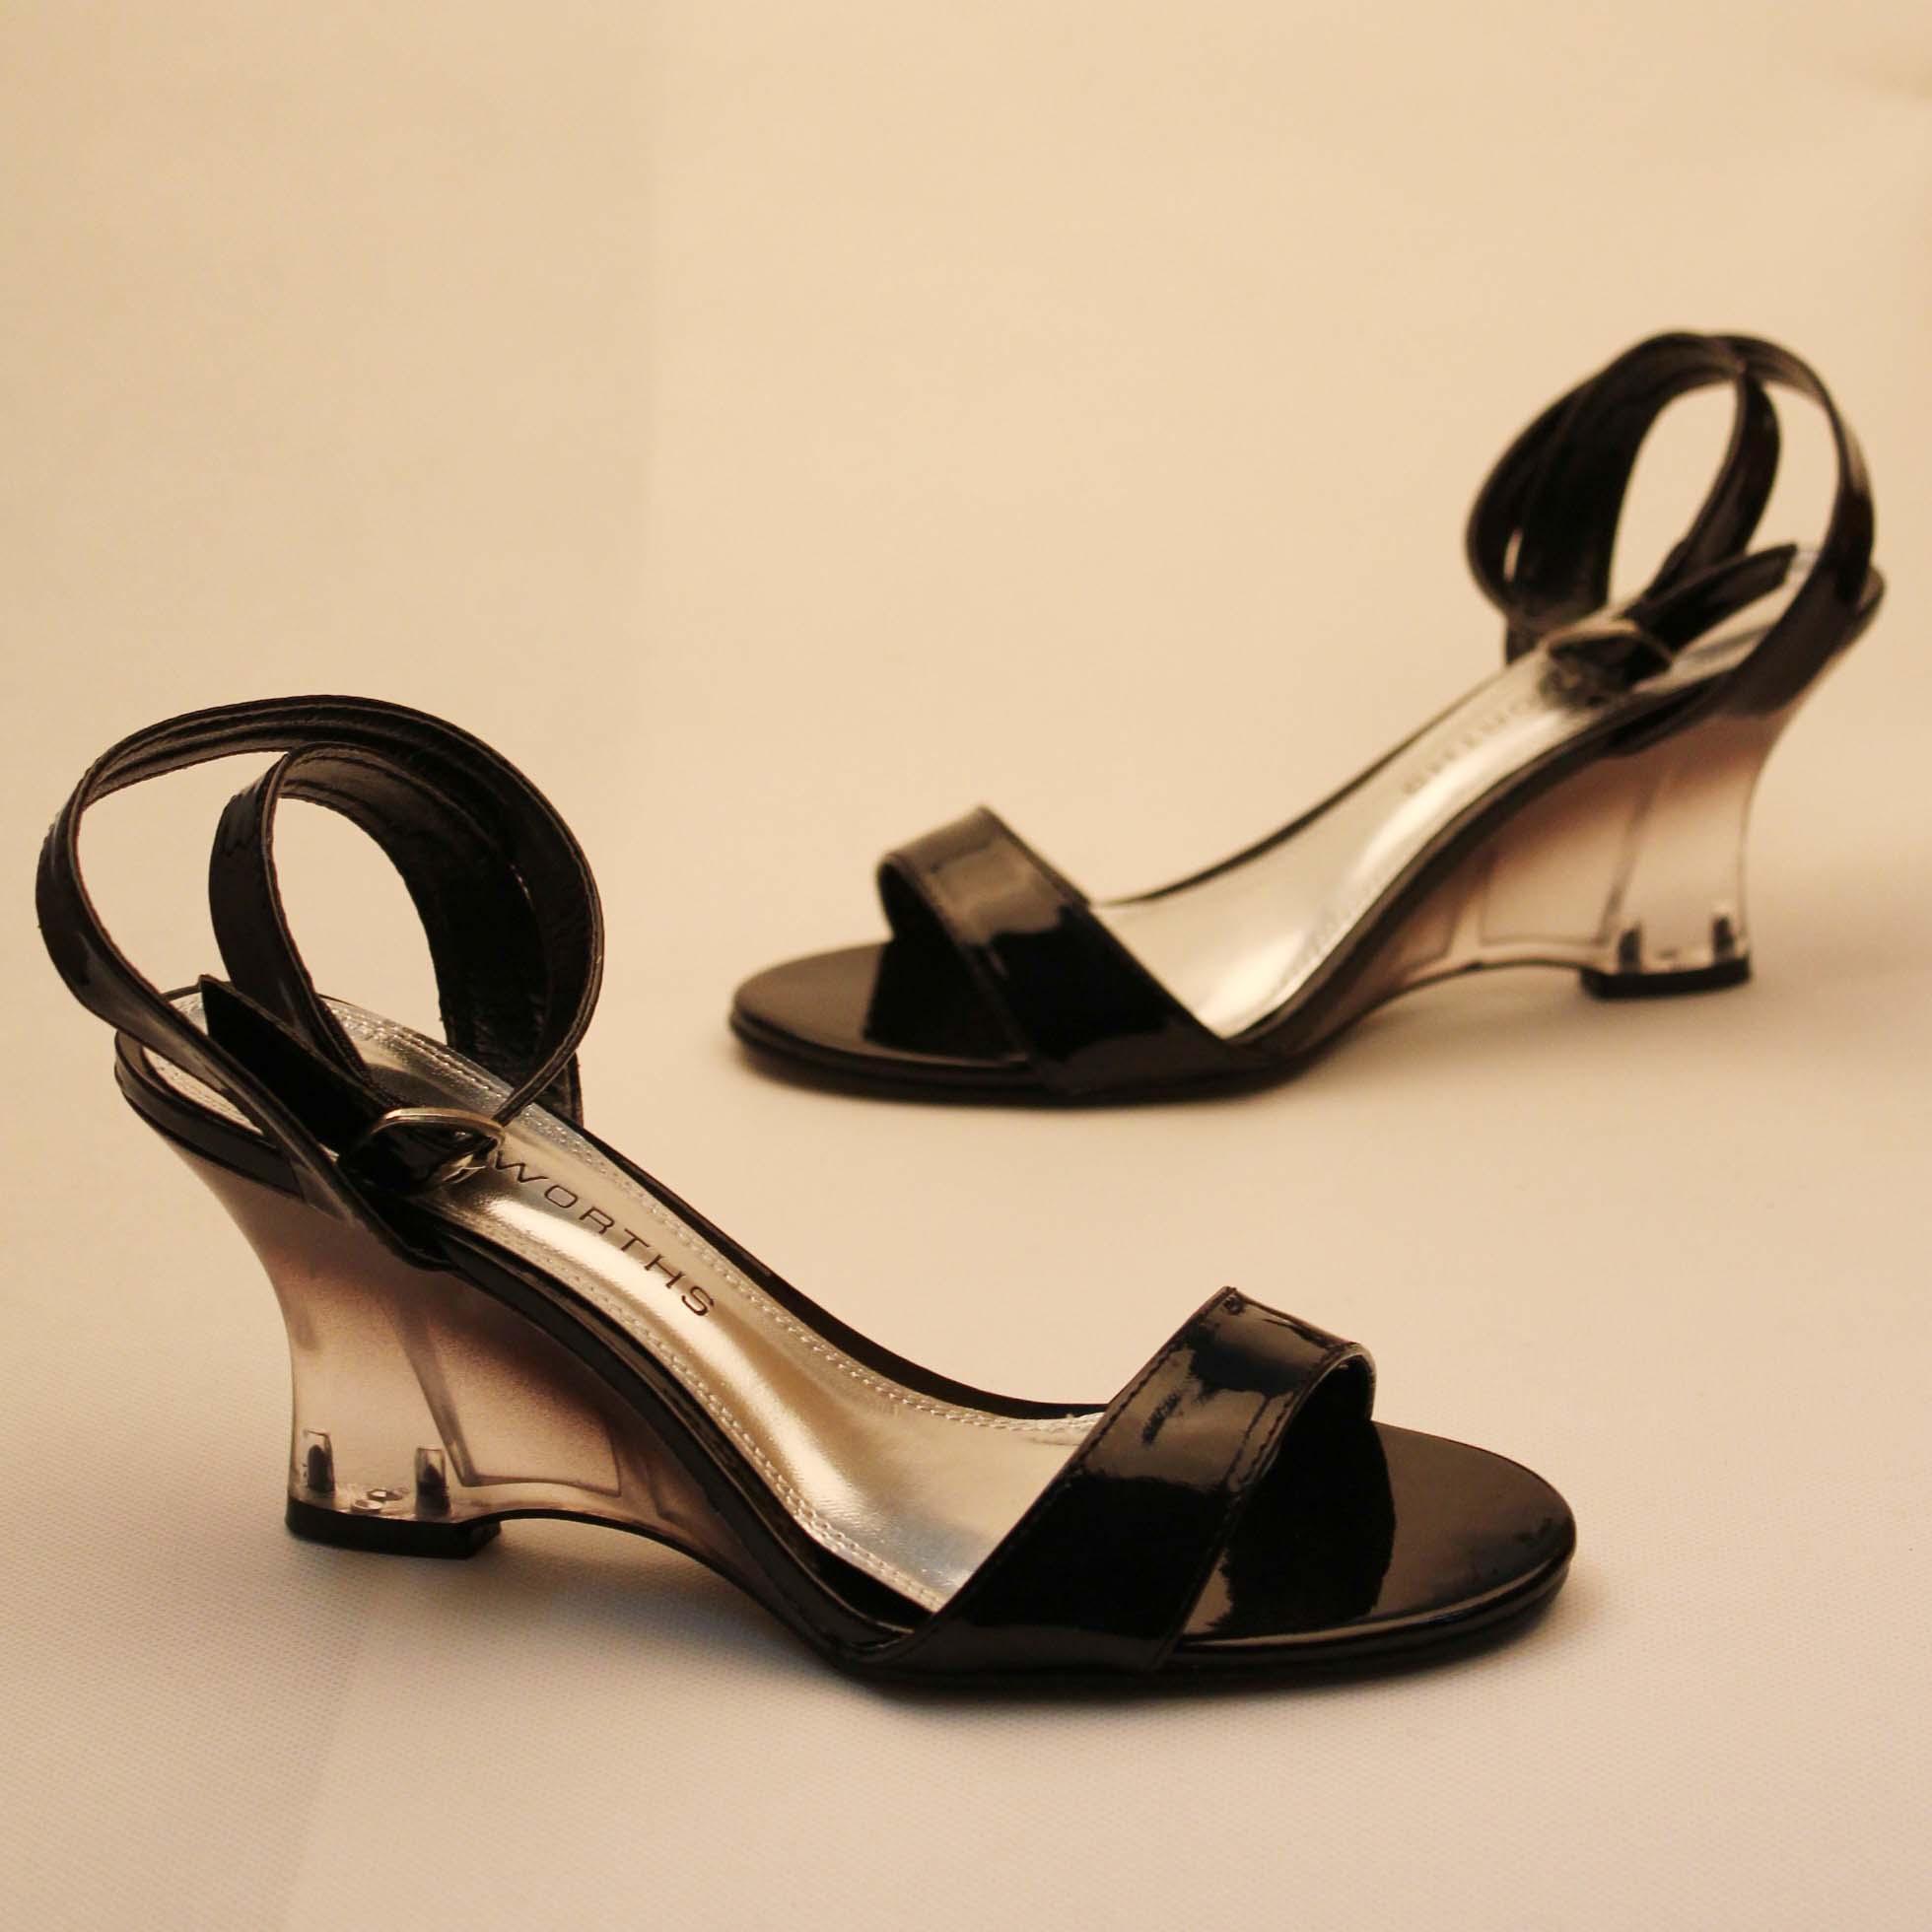 Free Shipping Fashion Truworths Transparent Heel Sandals